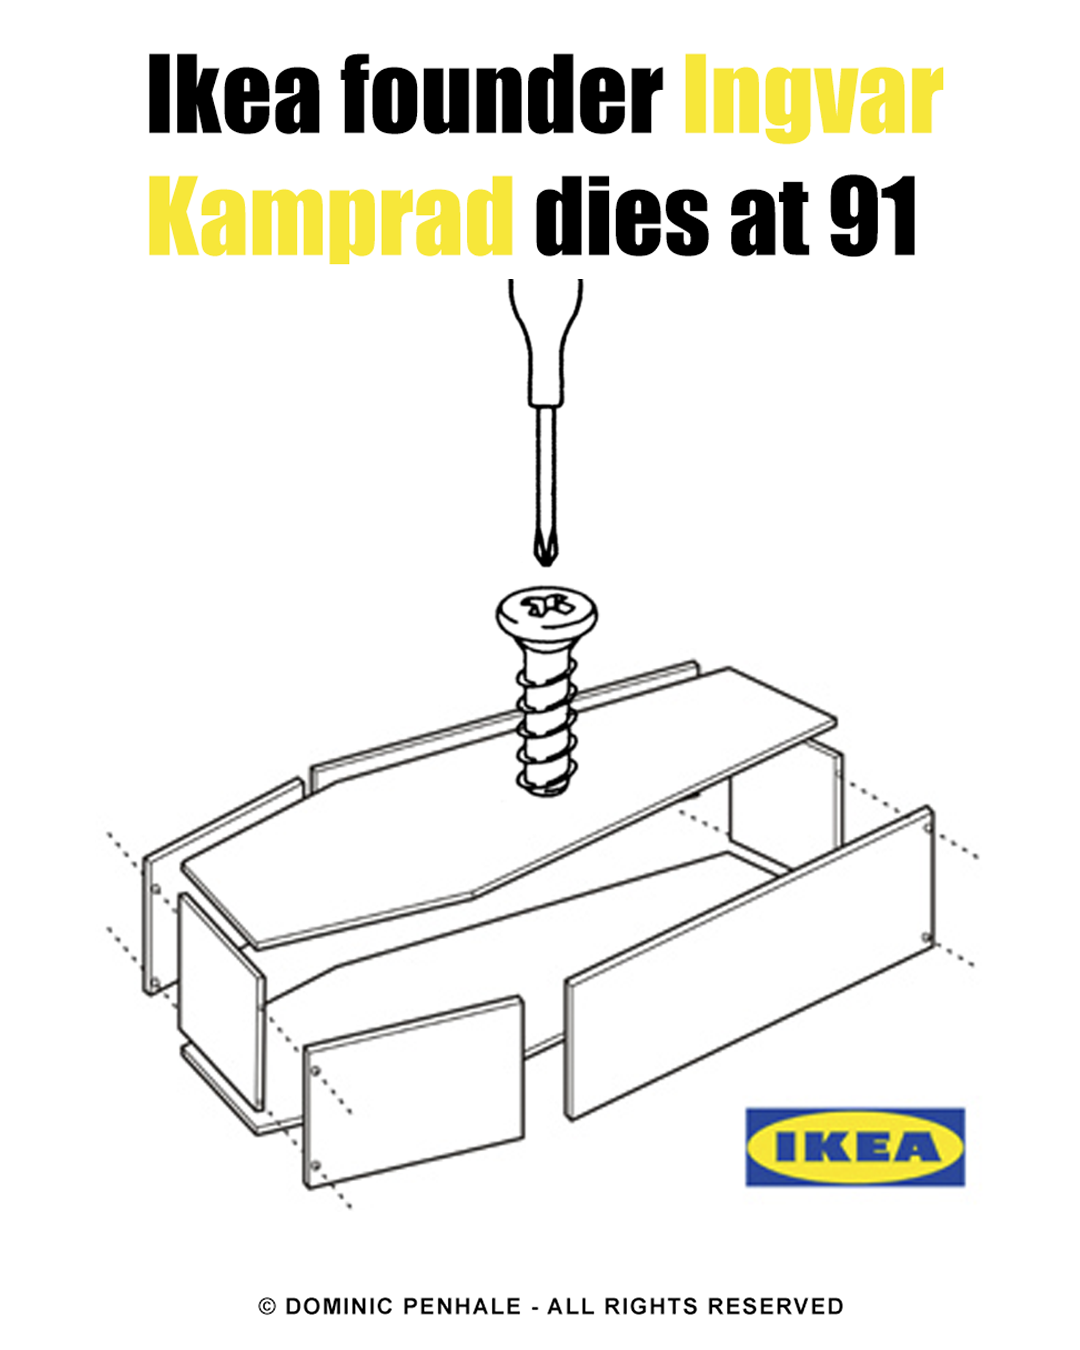 Dominic Penhale - Ikea Founder Dies.png